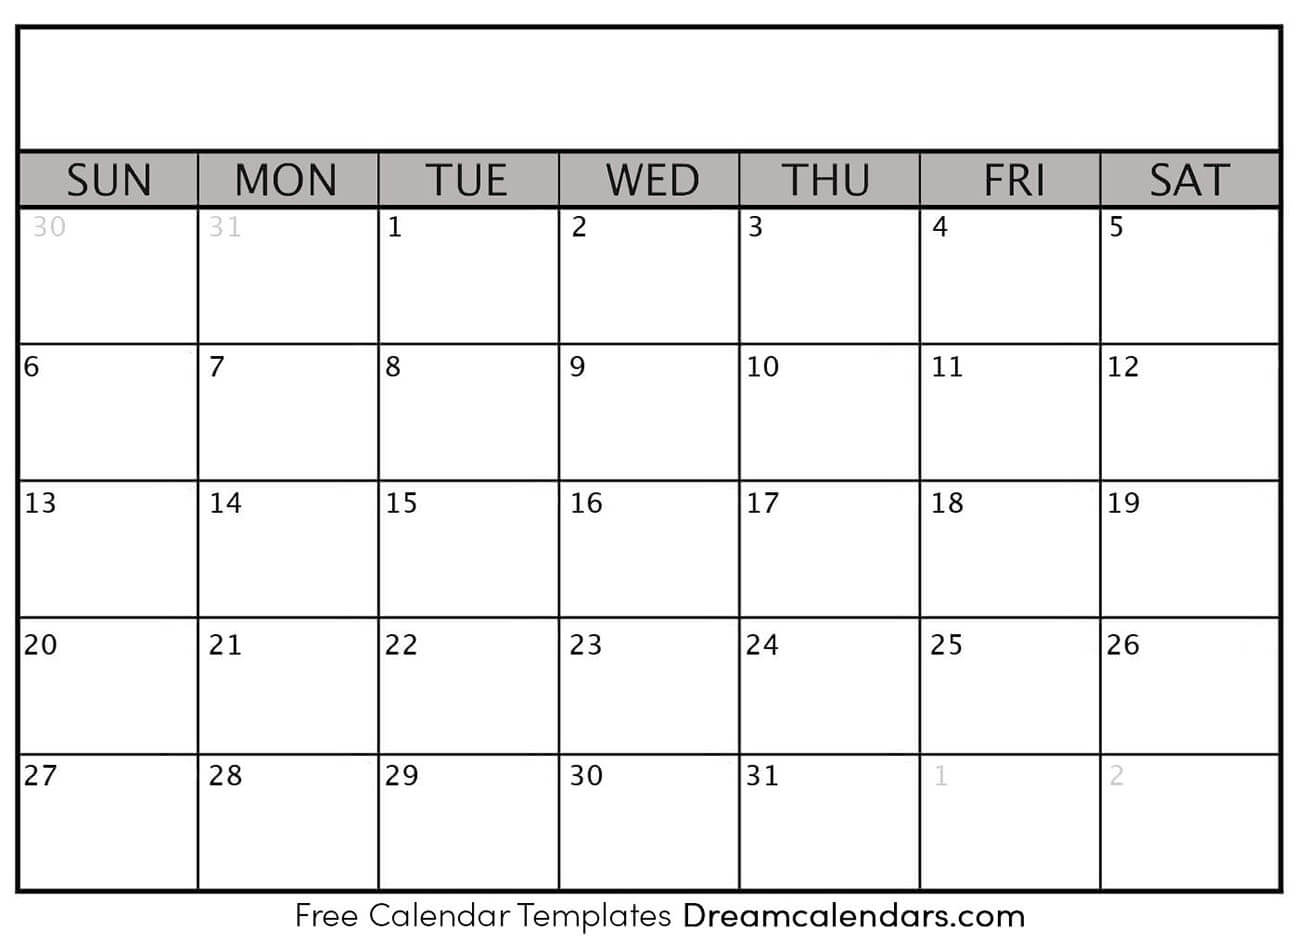 Printable Blank Calendar 2020 | Dream Calendars in Printable Calendar Date Range